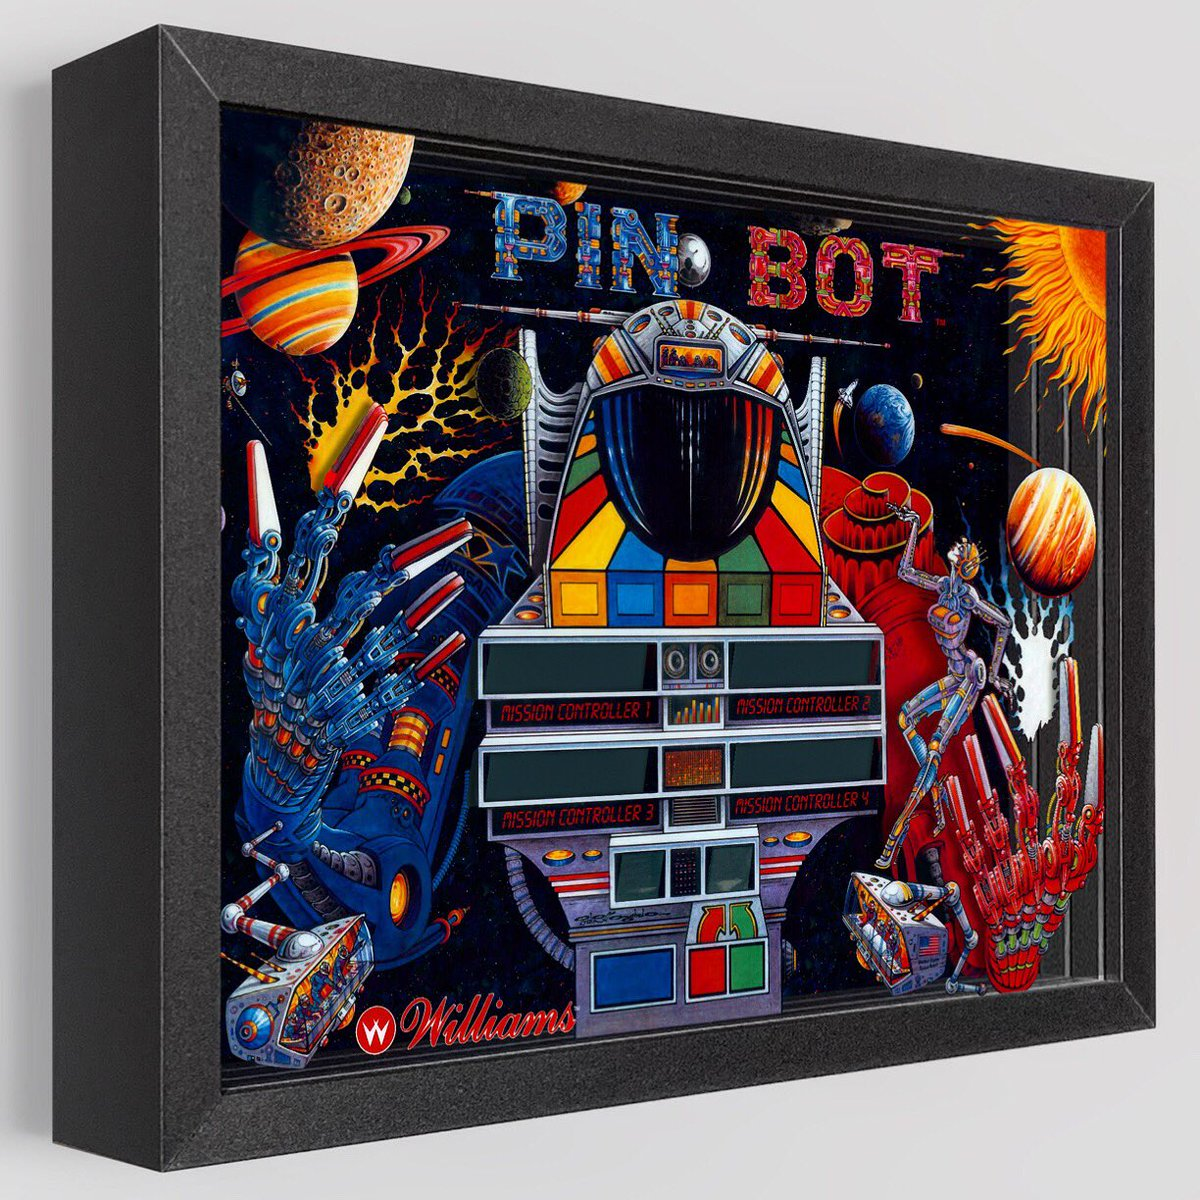 PIN•BOT Circuits Activated https://t.co/paFg018SgS #art #artwork #shadowbox #pinball #pinbot #robot #arcade #game #gamer #gamergirls #gamerguy #pinballmachine #retro #pinballart #pinballlife #decor #gameroomdecor #williams #fun #3d https://t.co/0bfxDgDbd0